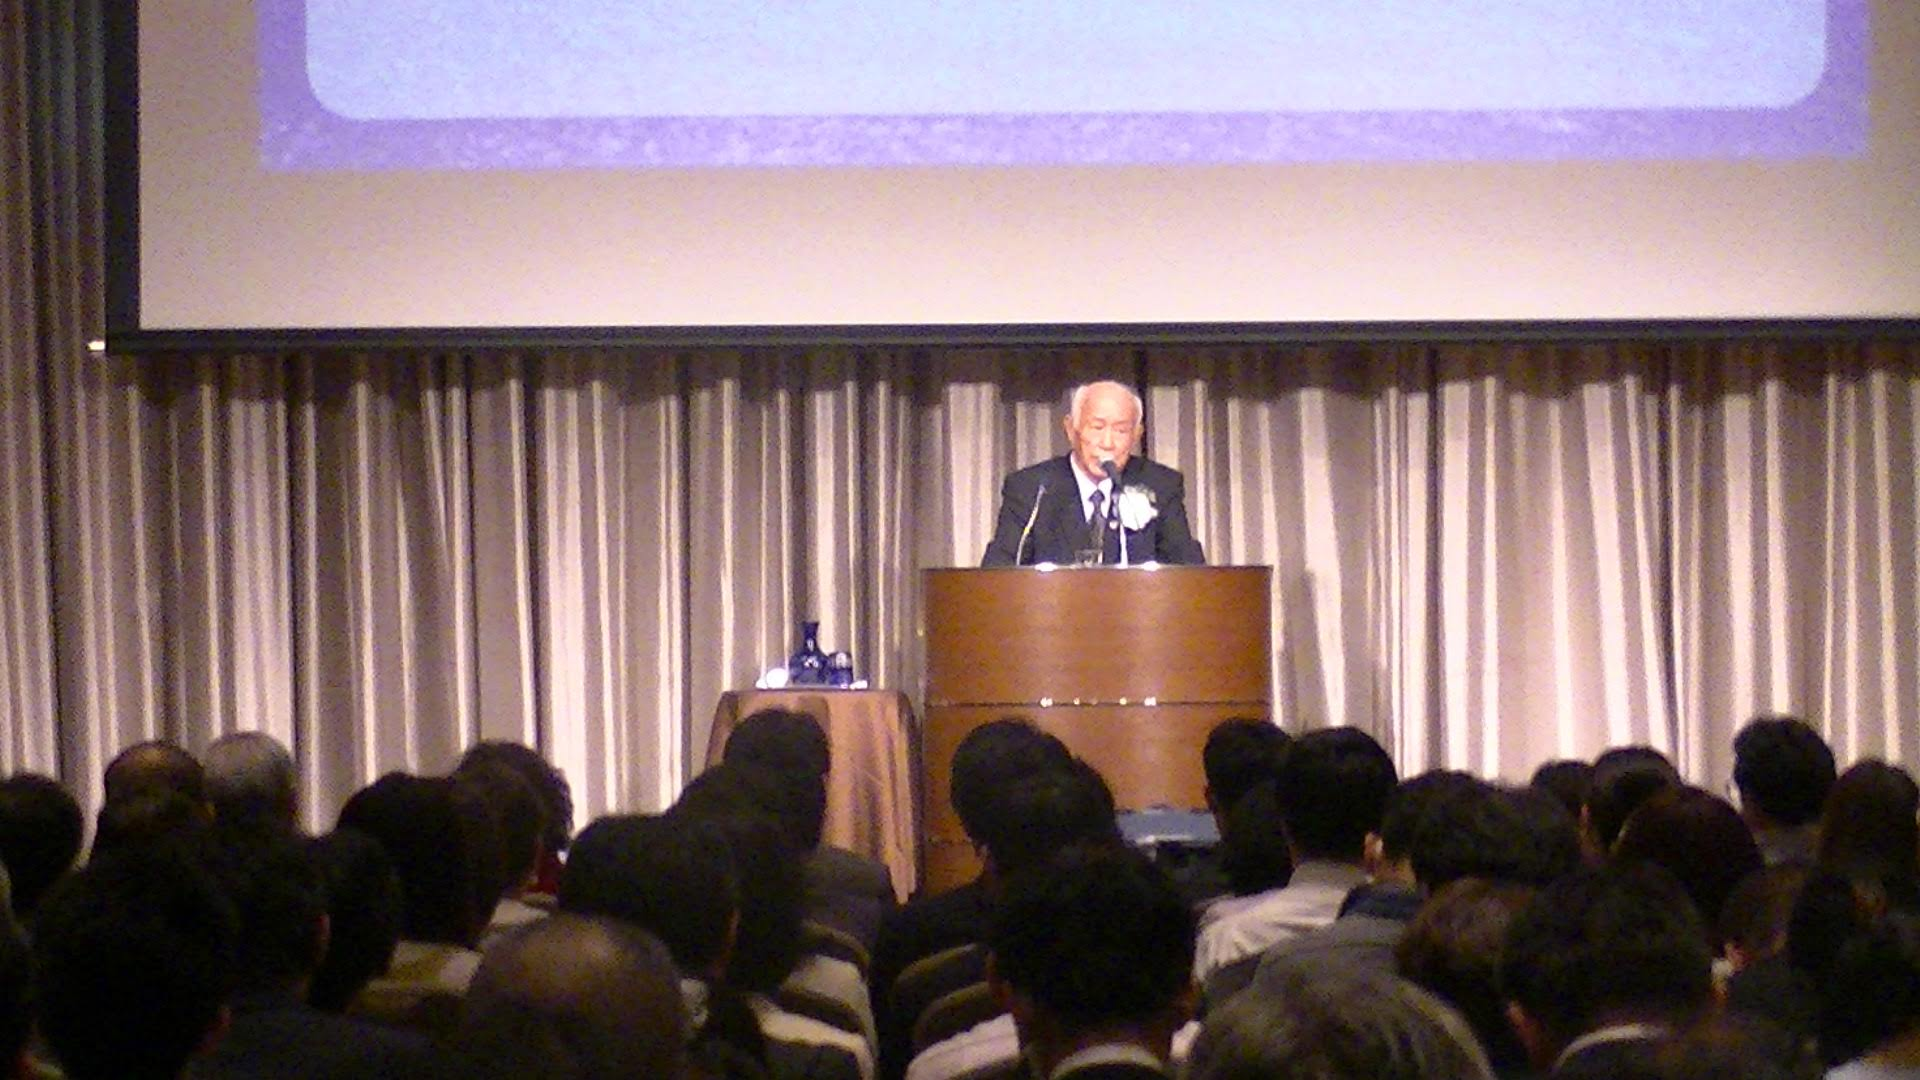 PIC 1657 1 - 思風会全国大会in広島